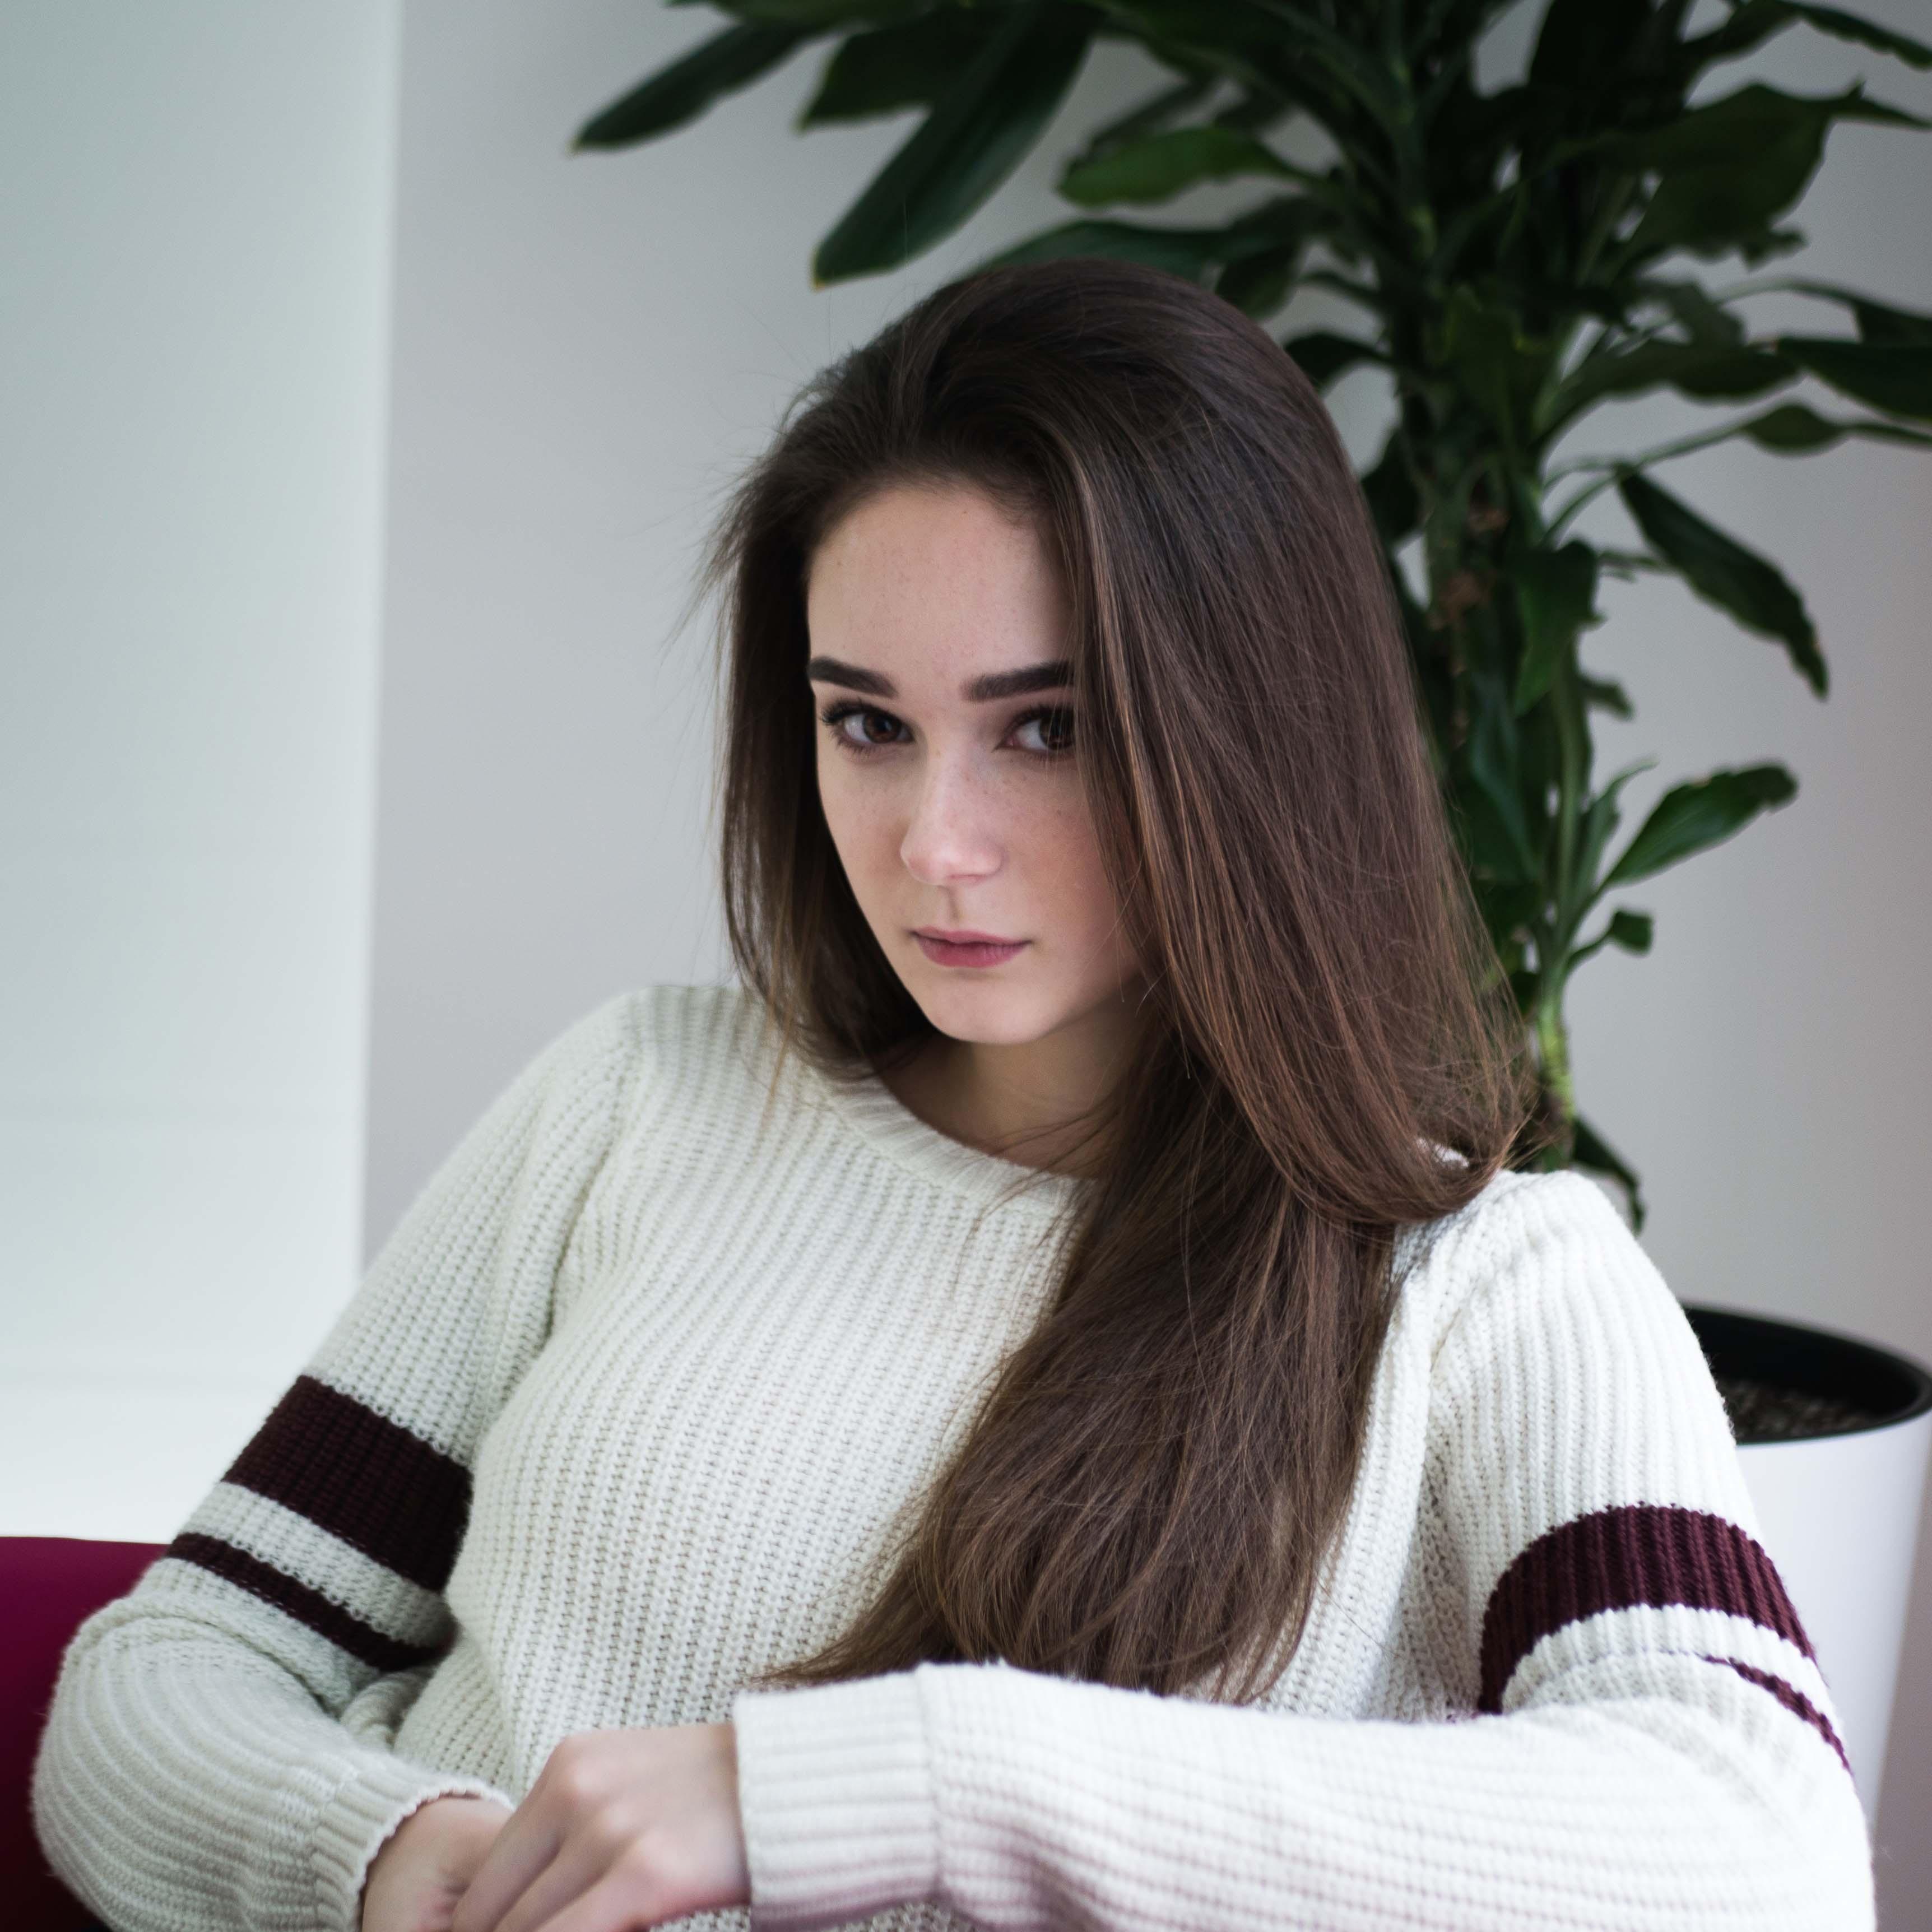 Go to Valerie Lendel's profile